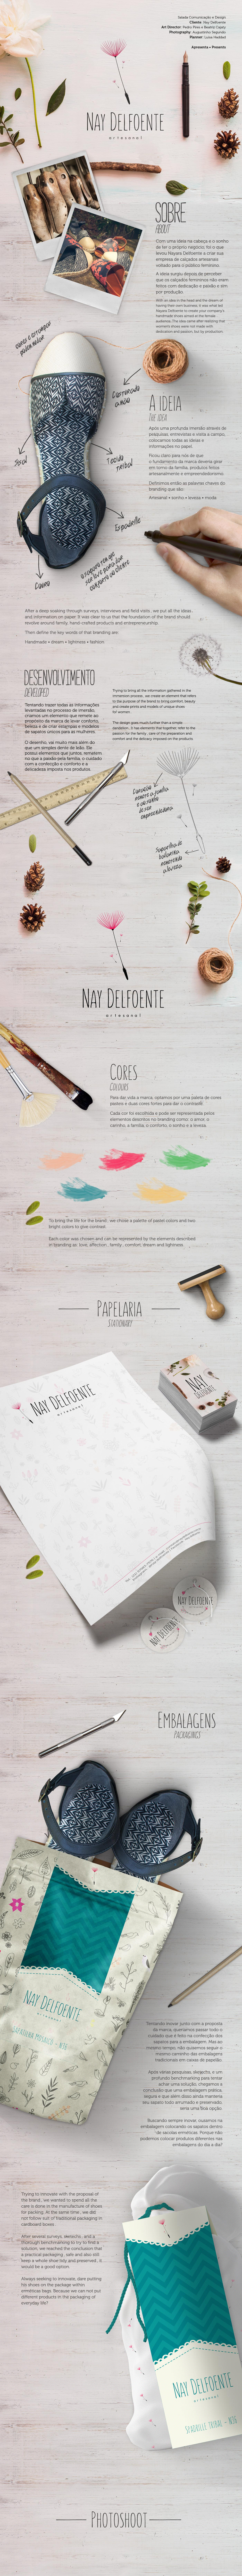 brand Sapatos artesanal marca nayara design thinking espadrille saladacomunicacao